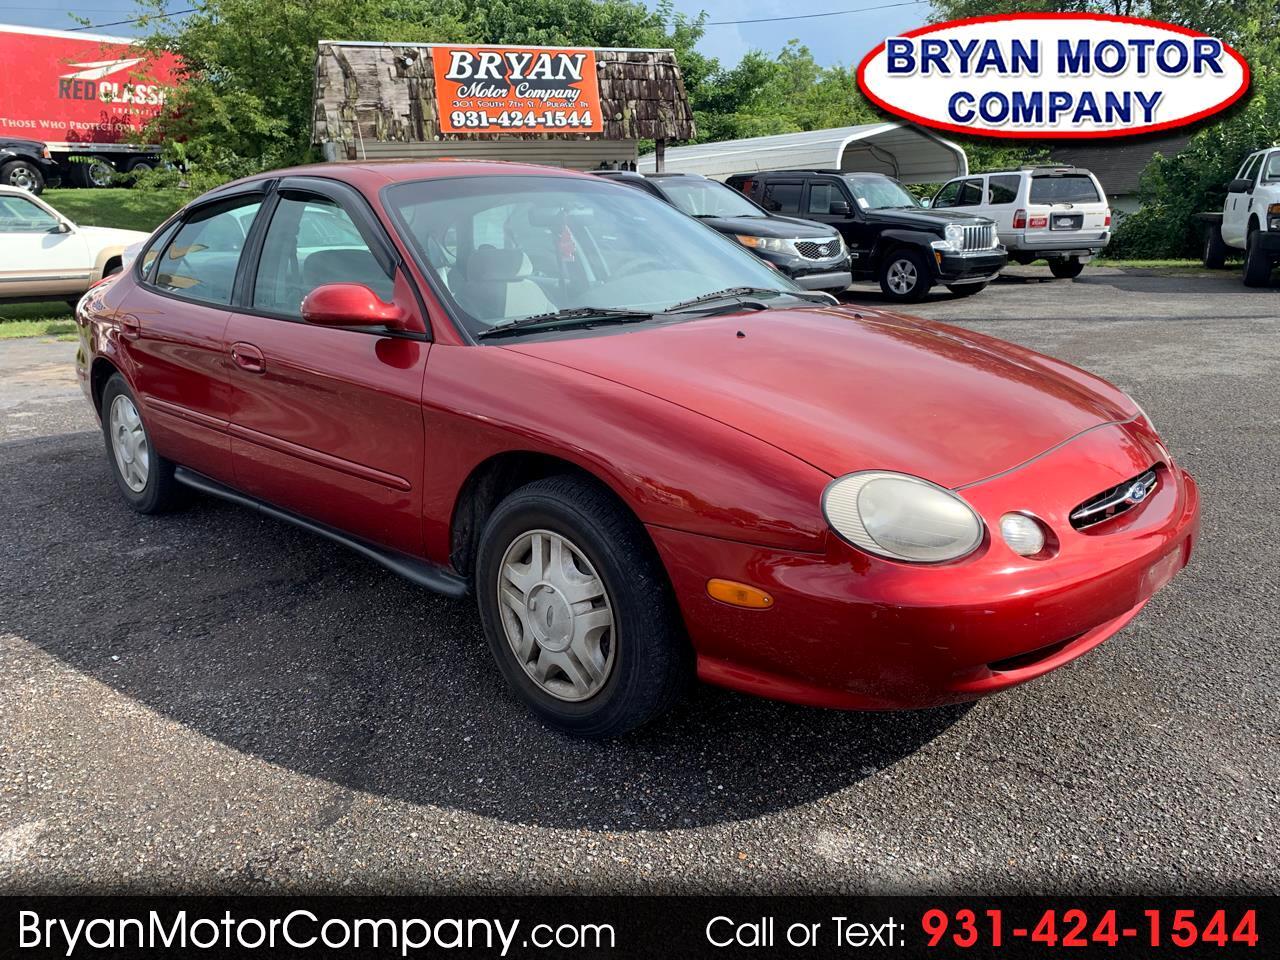 1999 Ford Taurus 4dr Sdn SE